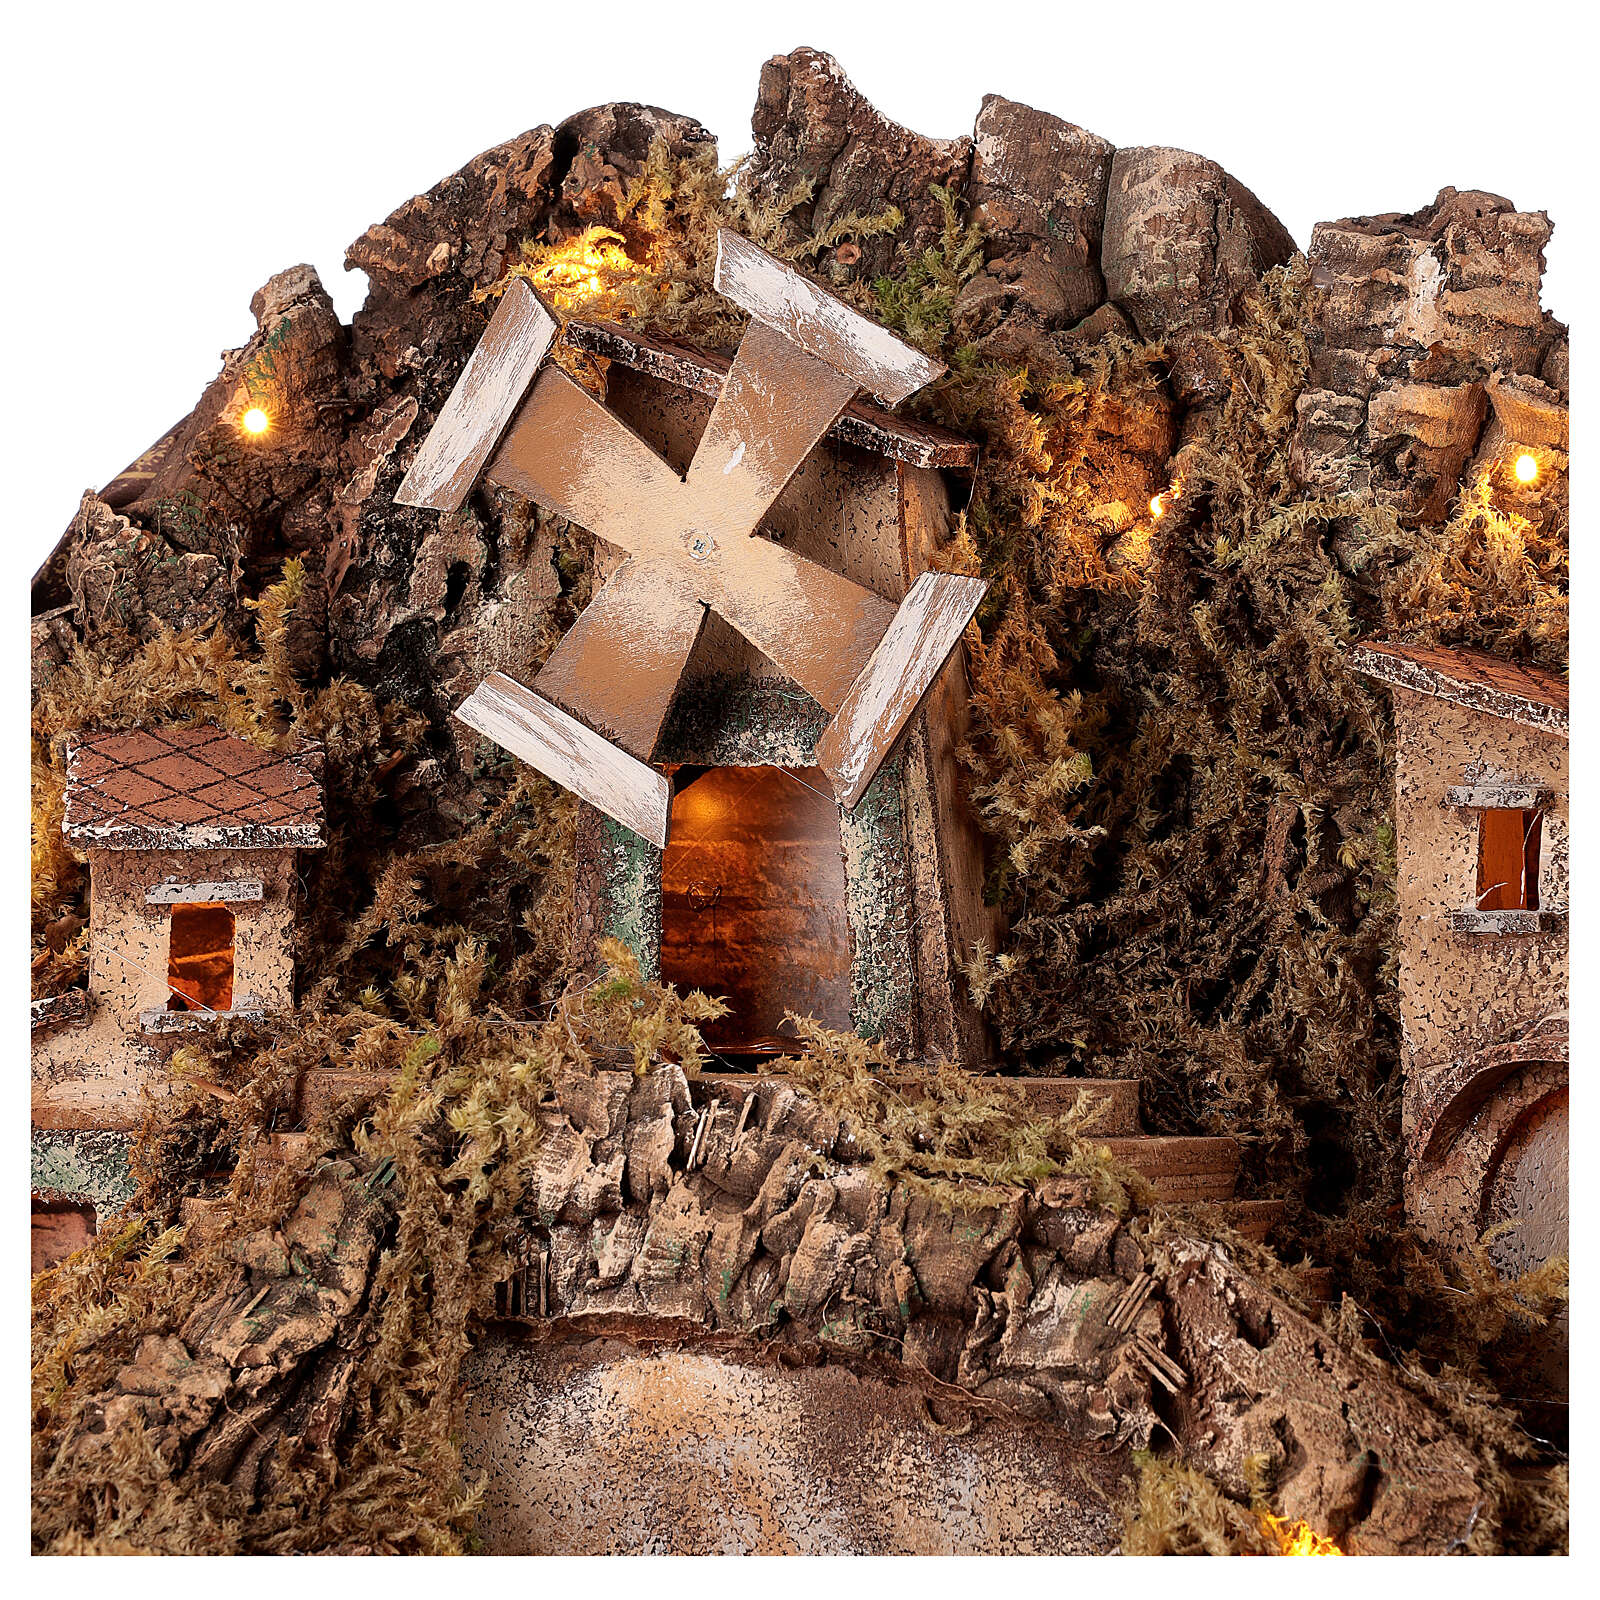 Fountain and windmill for statues 10-12 cm Neapolitan Nativity scene 50x60x50 4